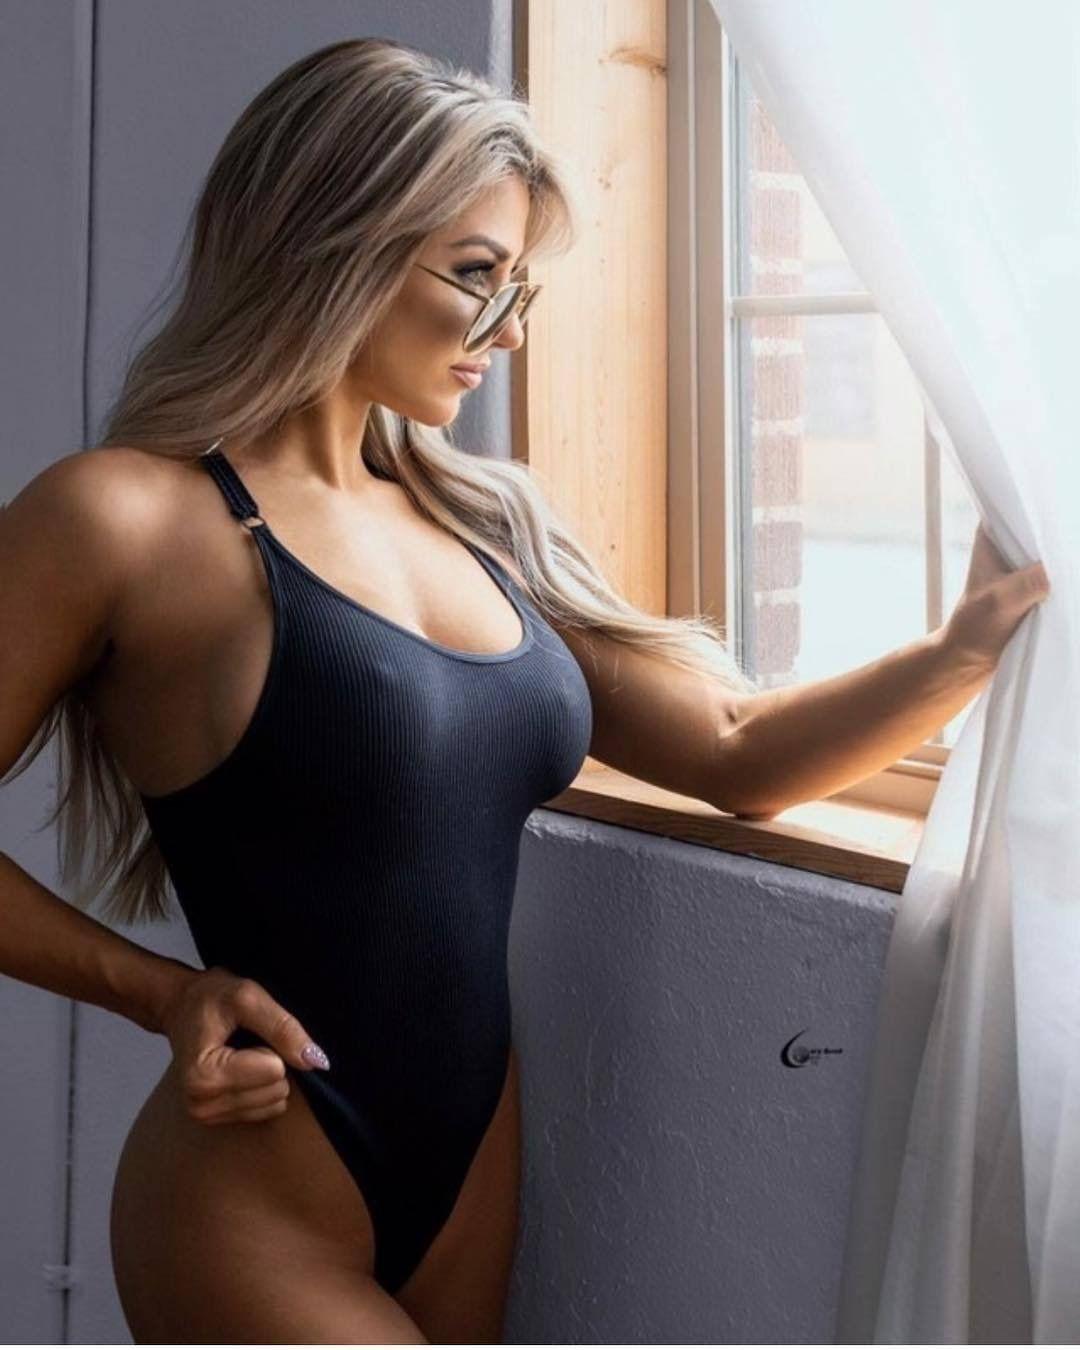 gina carano porn pictures